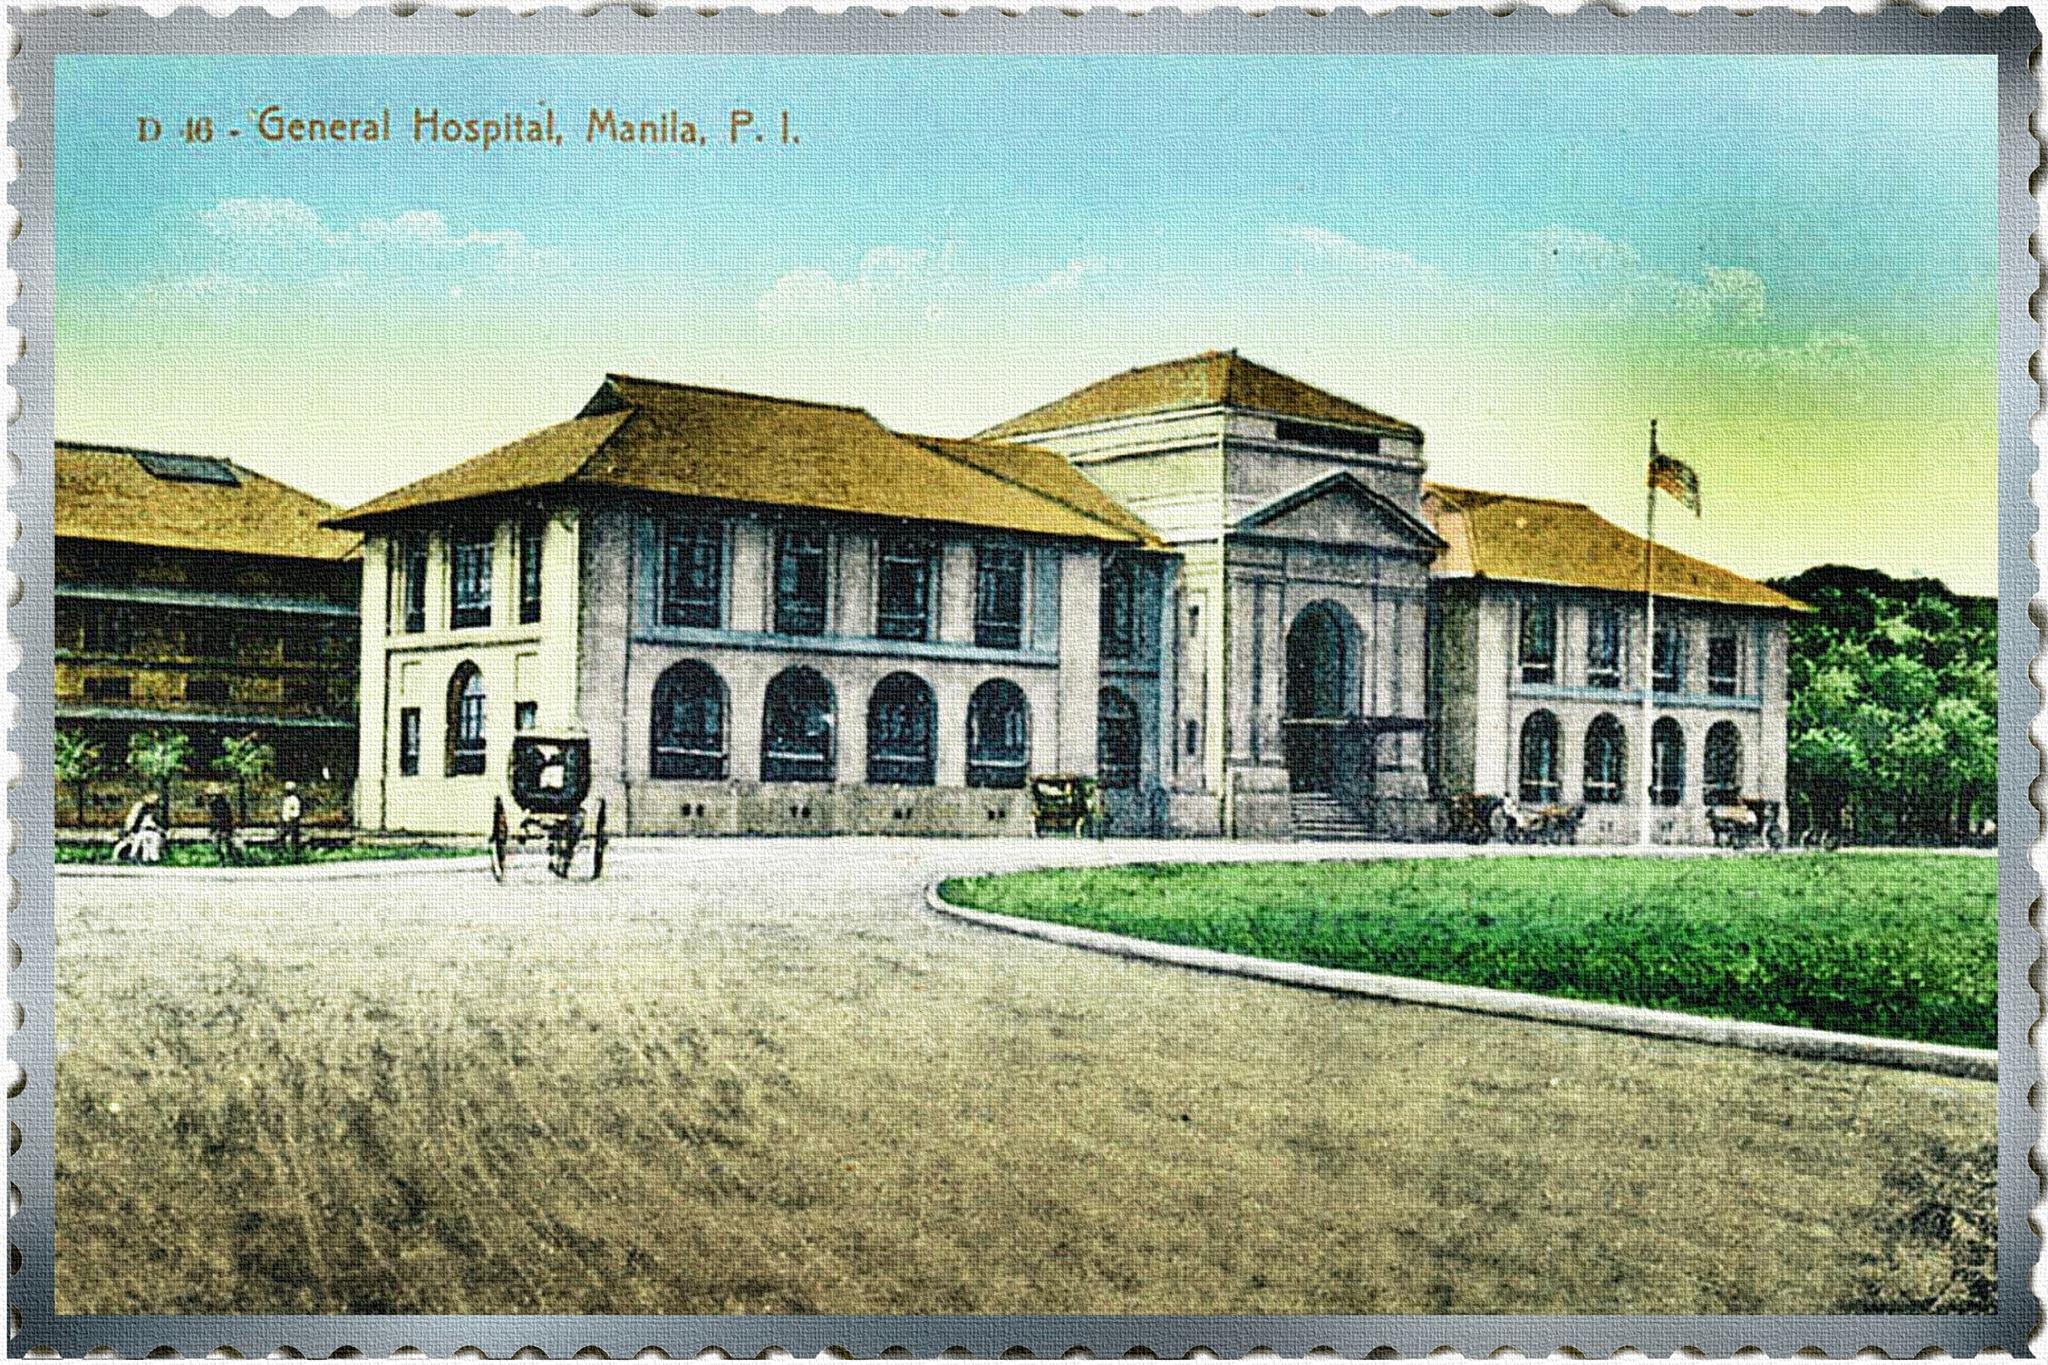 Philippine General Hospital, Manila